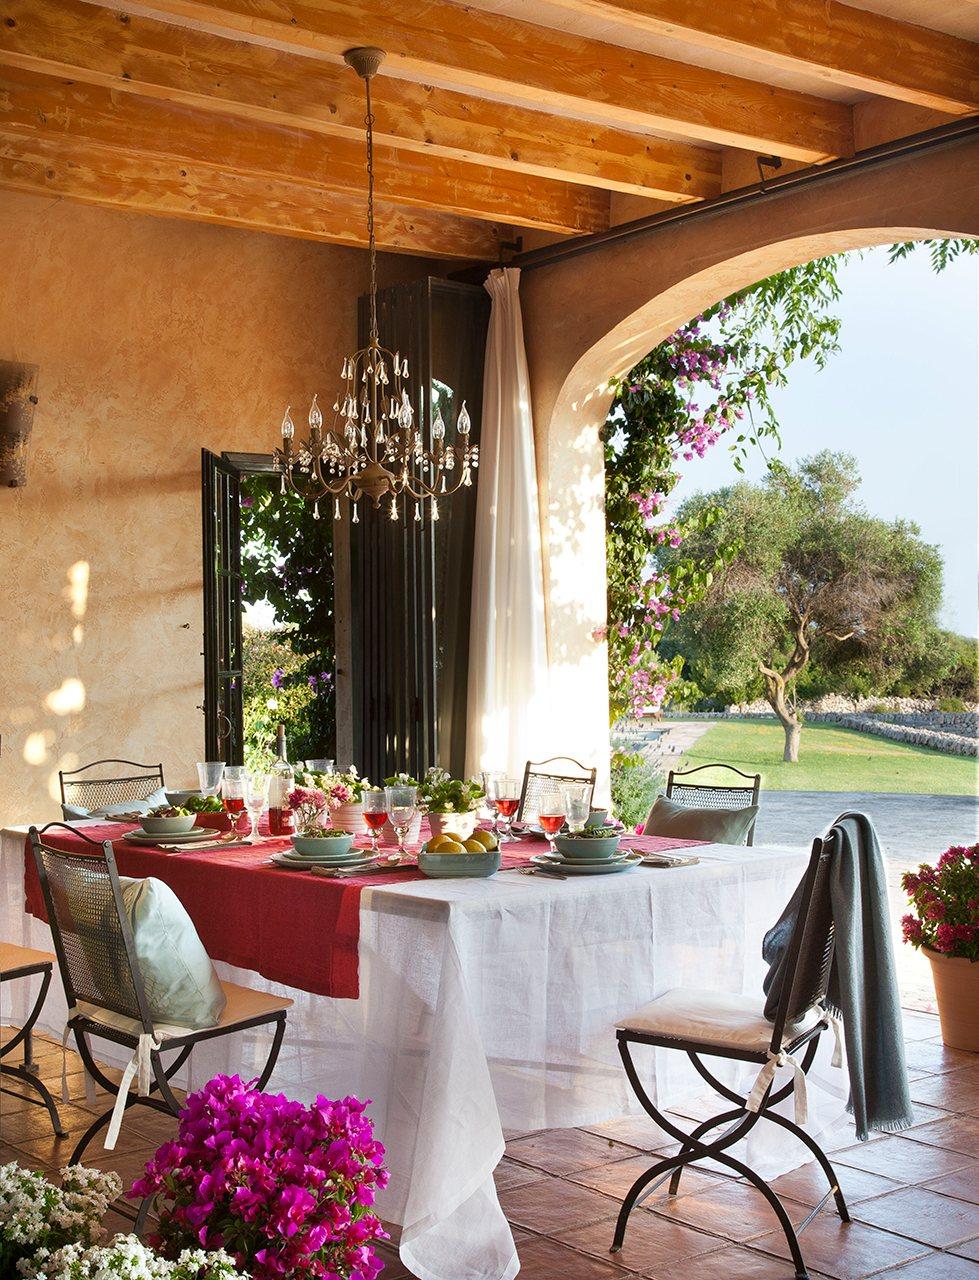 5 comedores de verano for Mesa porche